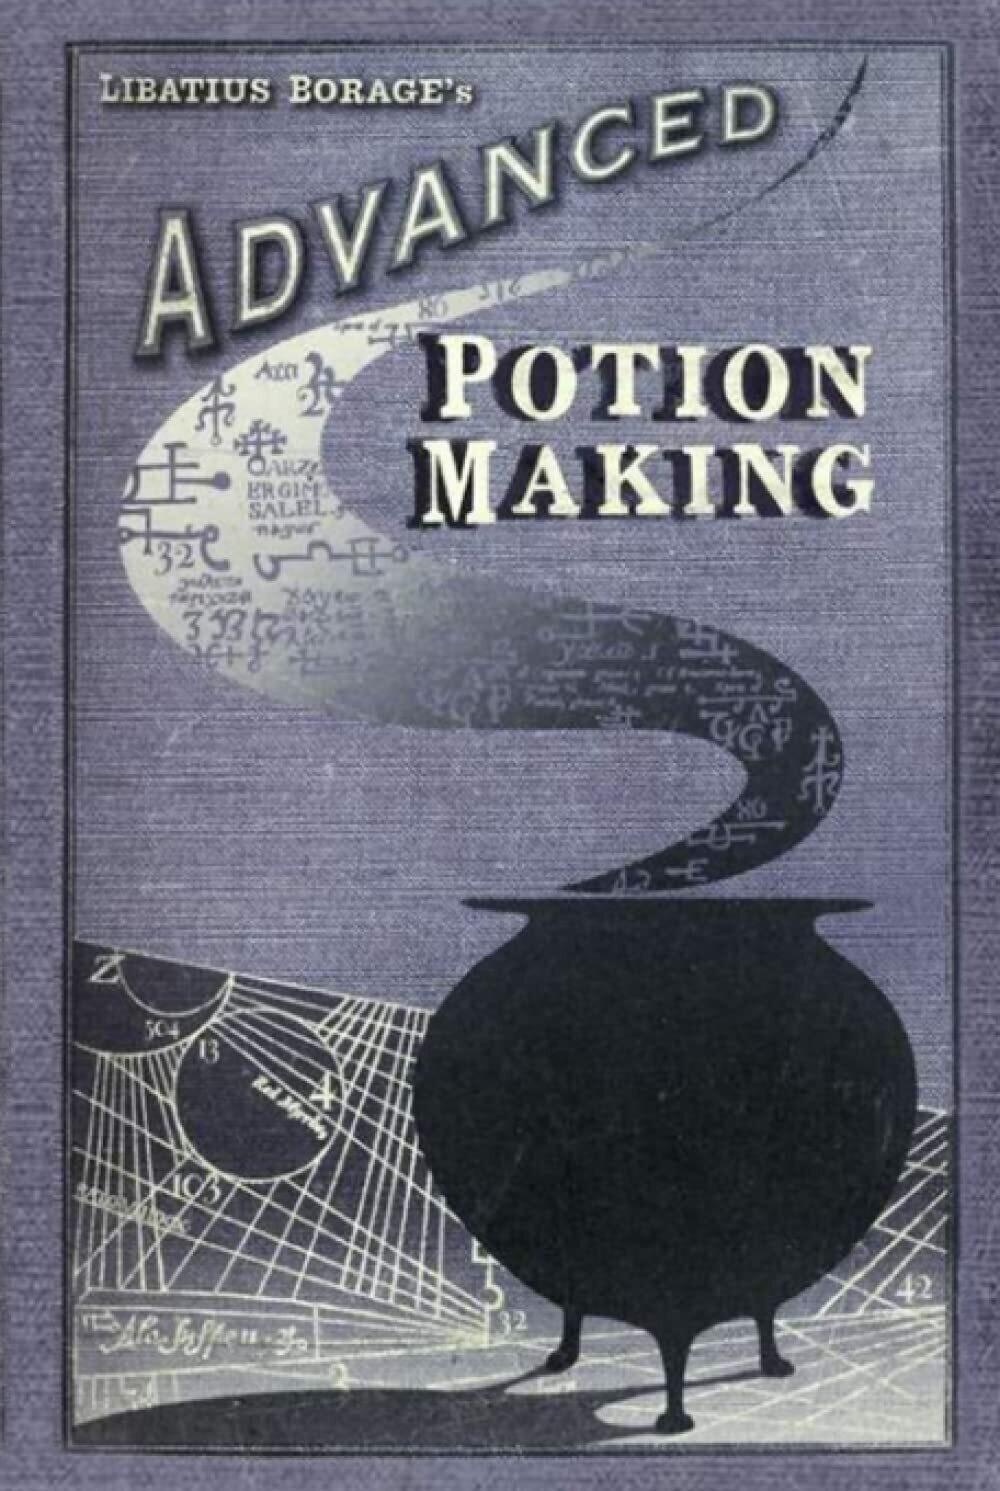 Advanced Potion Making [Wizardry & Magic - Harry Potter Hogwarts] Hardback Book - Movie Prop Replica